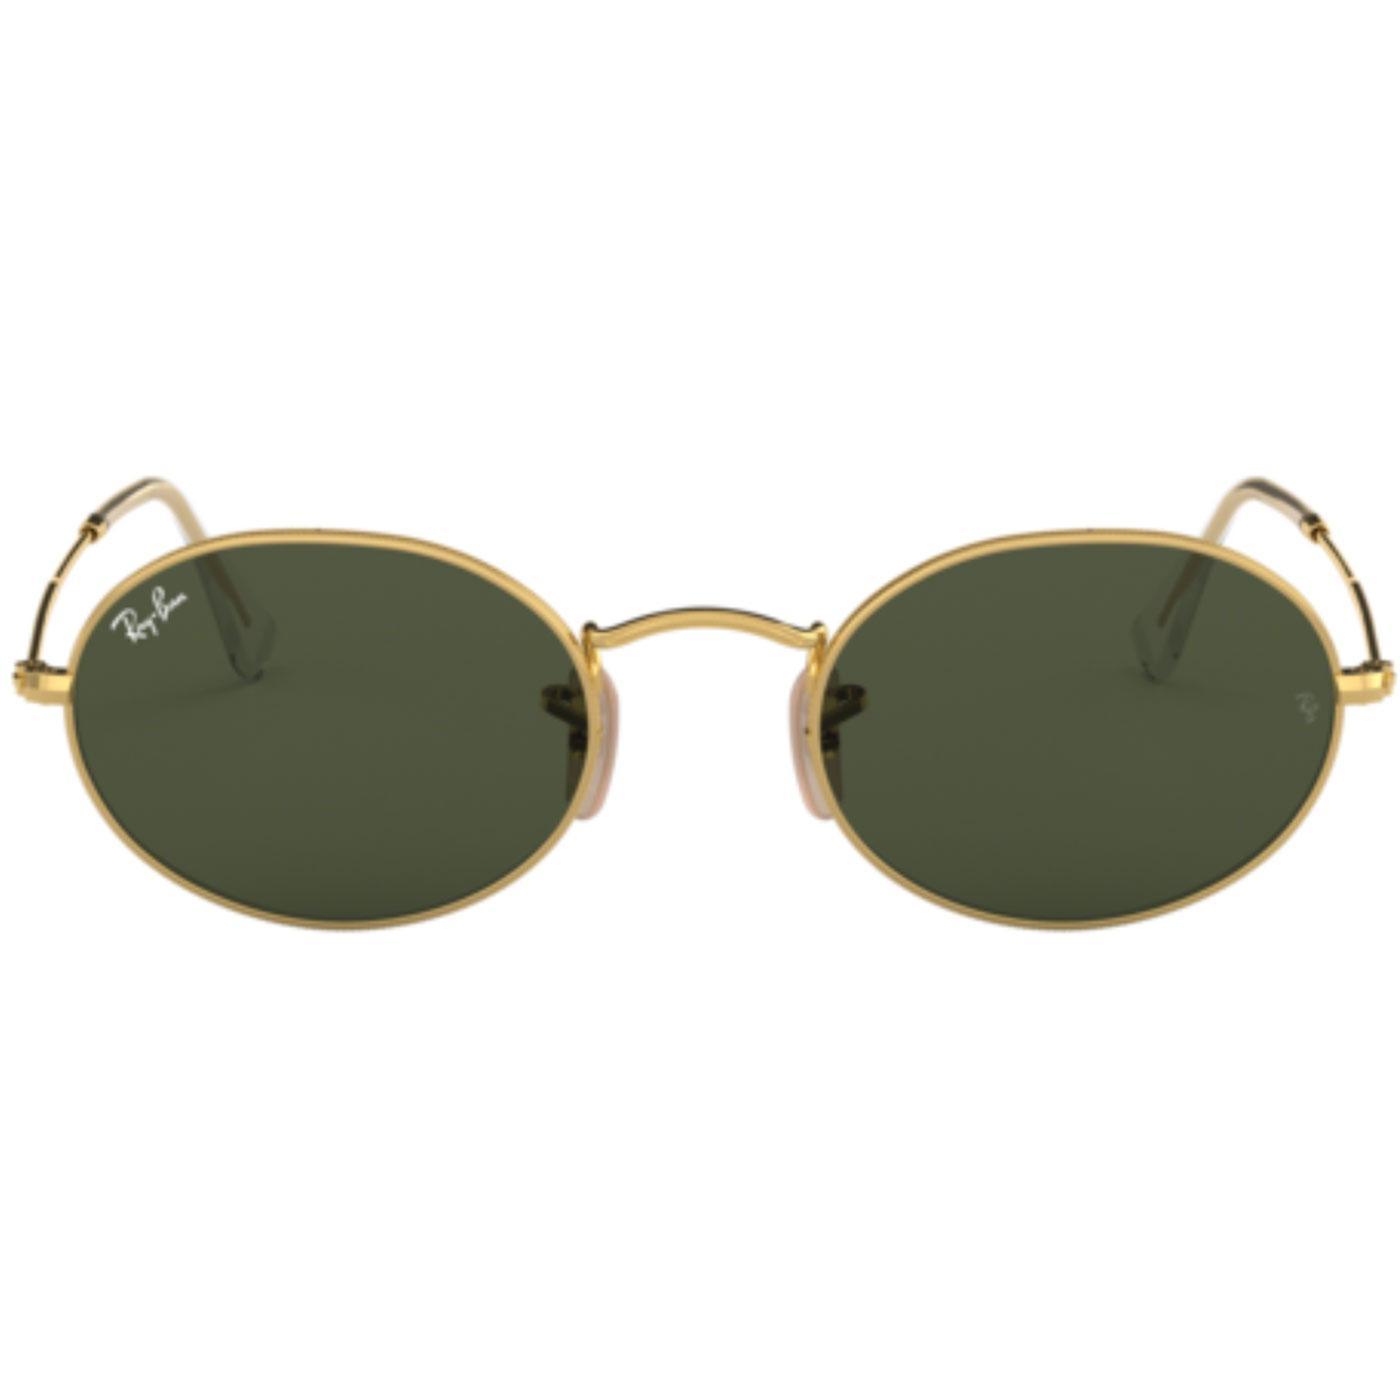 RAY-BAN Oval Retro 60s Mod Sunglasses Gold/Green